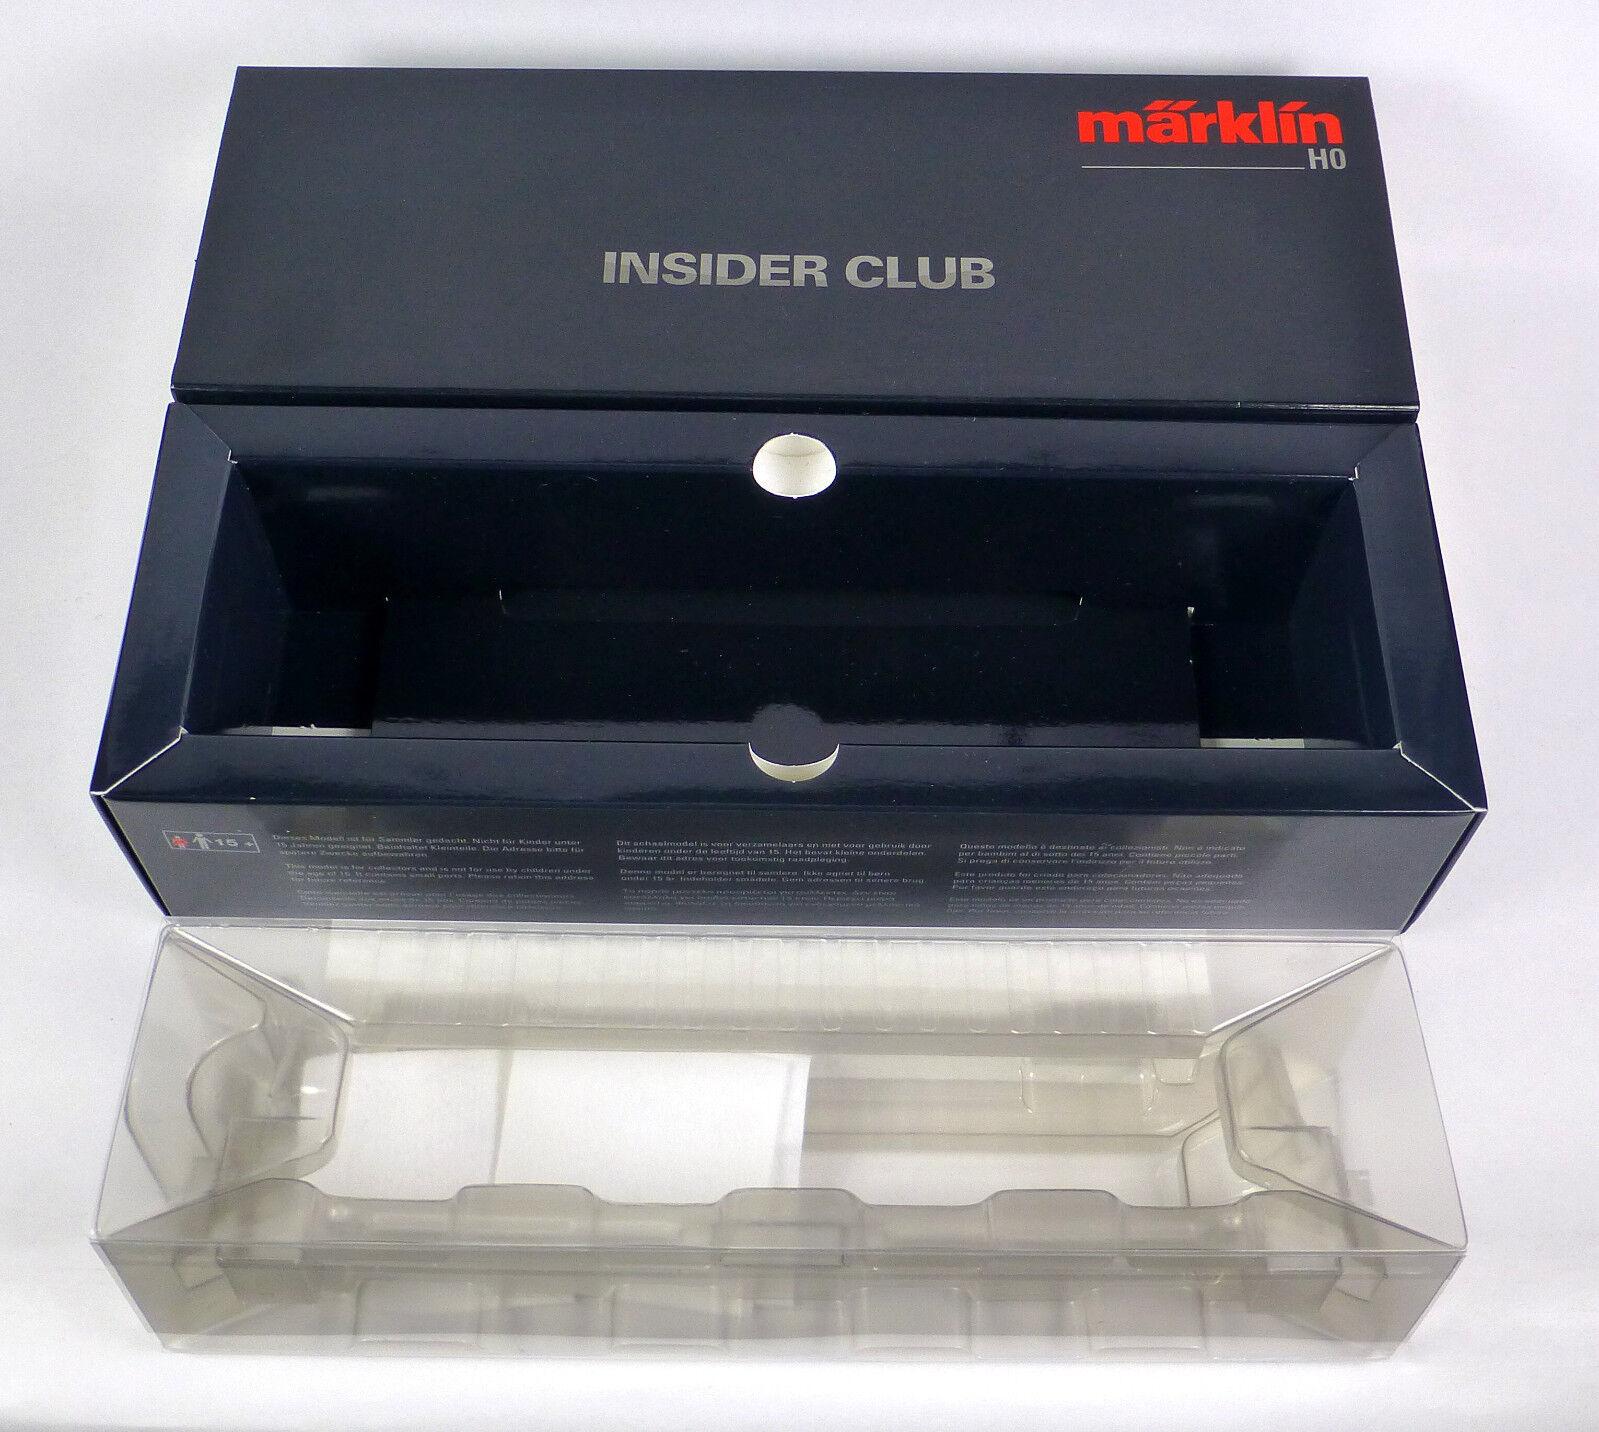 cartone vuoto 39170 E-Lok BR 103 243-2 tè mfx Digital Insider Club OVP h0